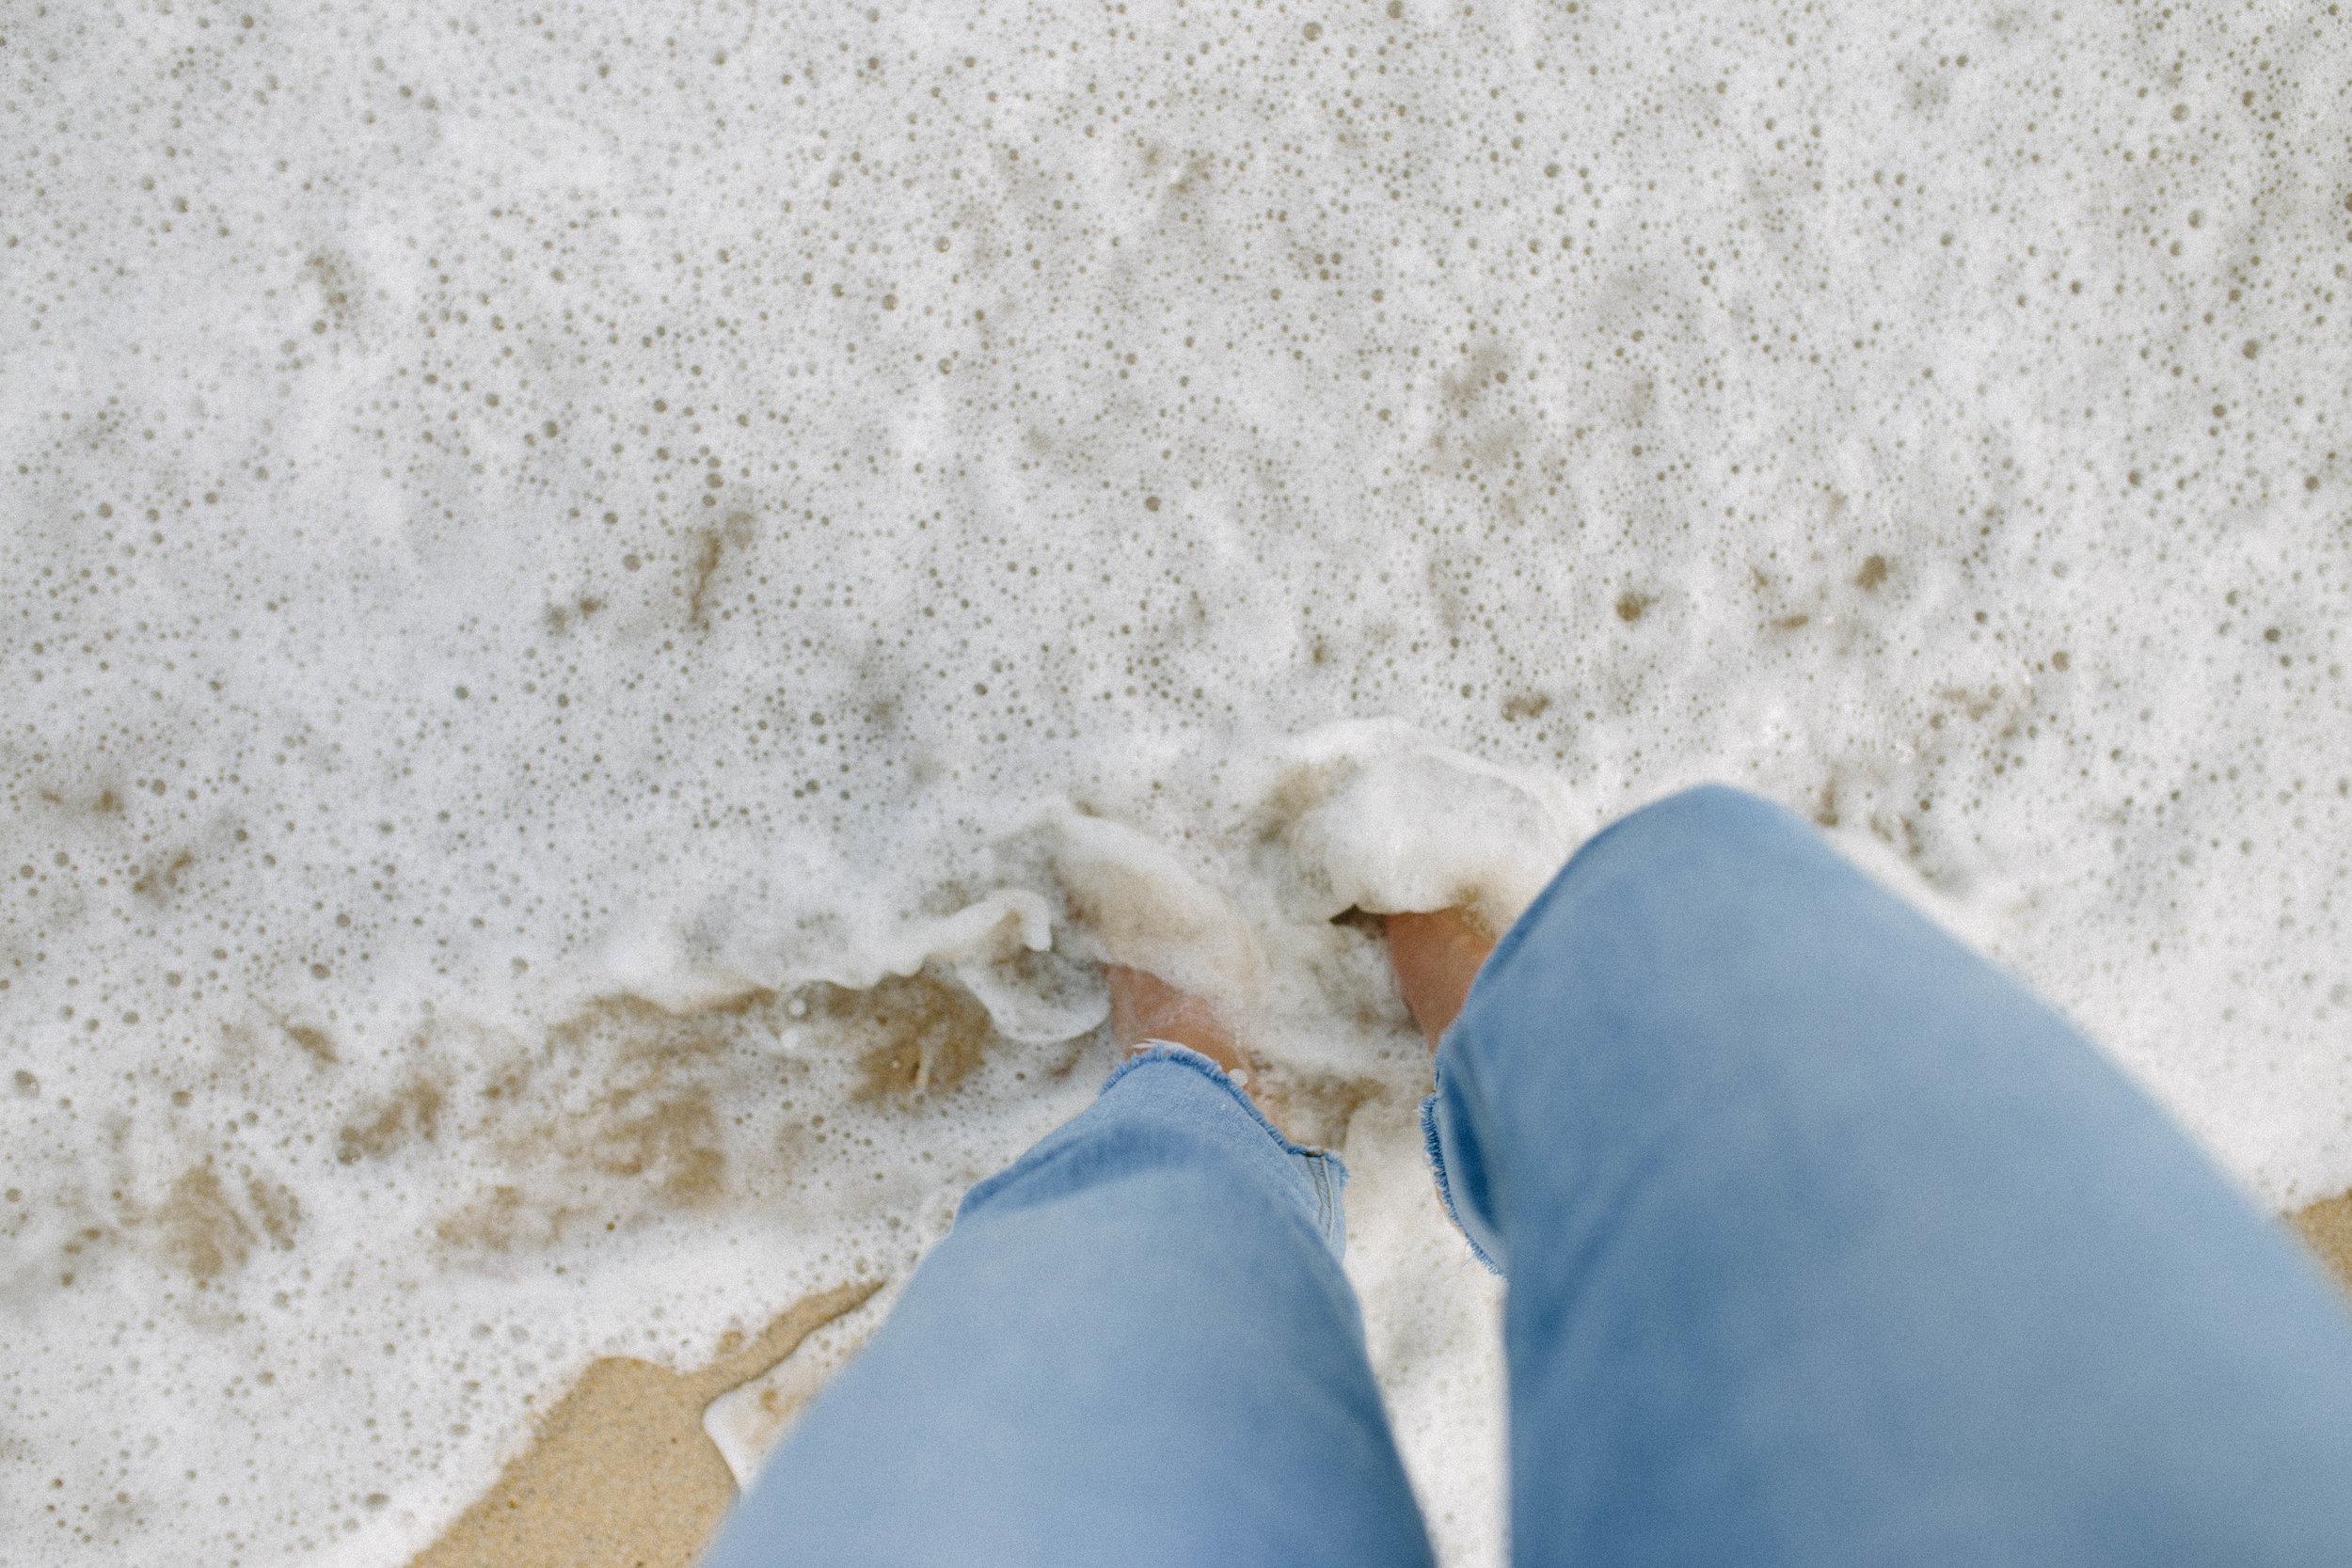 feet-in-ocean.jpg